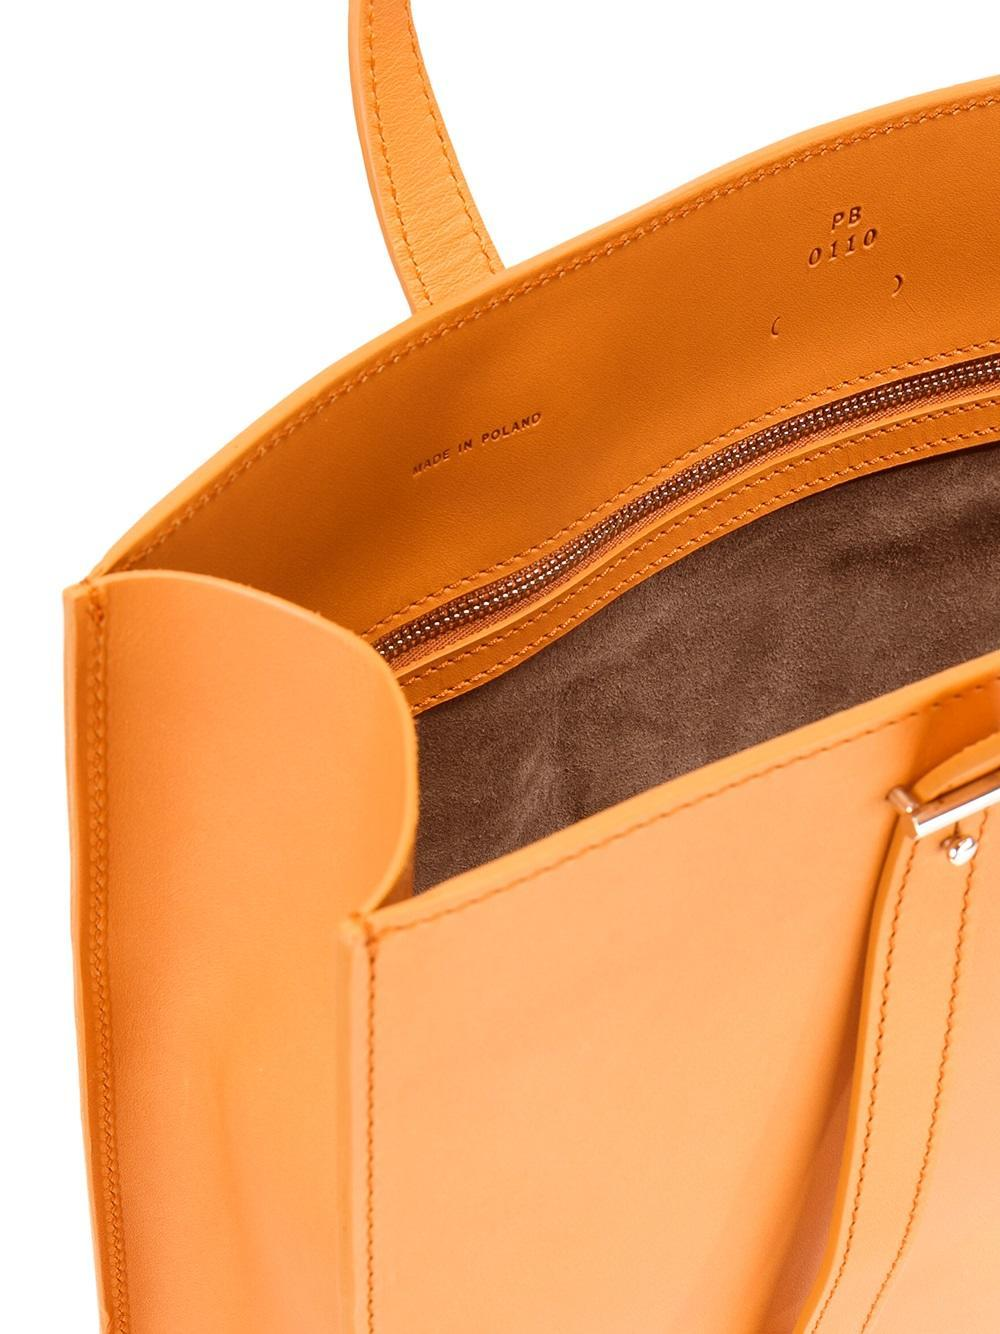 PB 0110 Leather Rectangular Tote